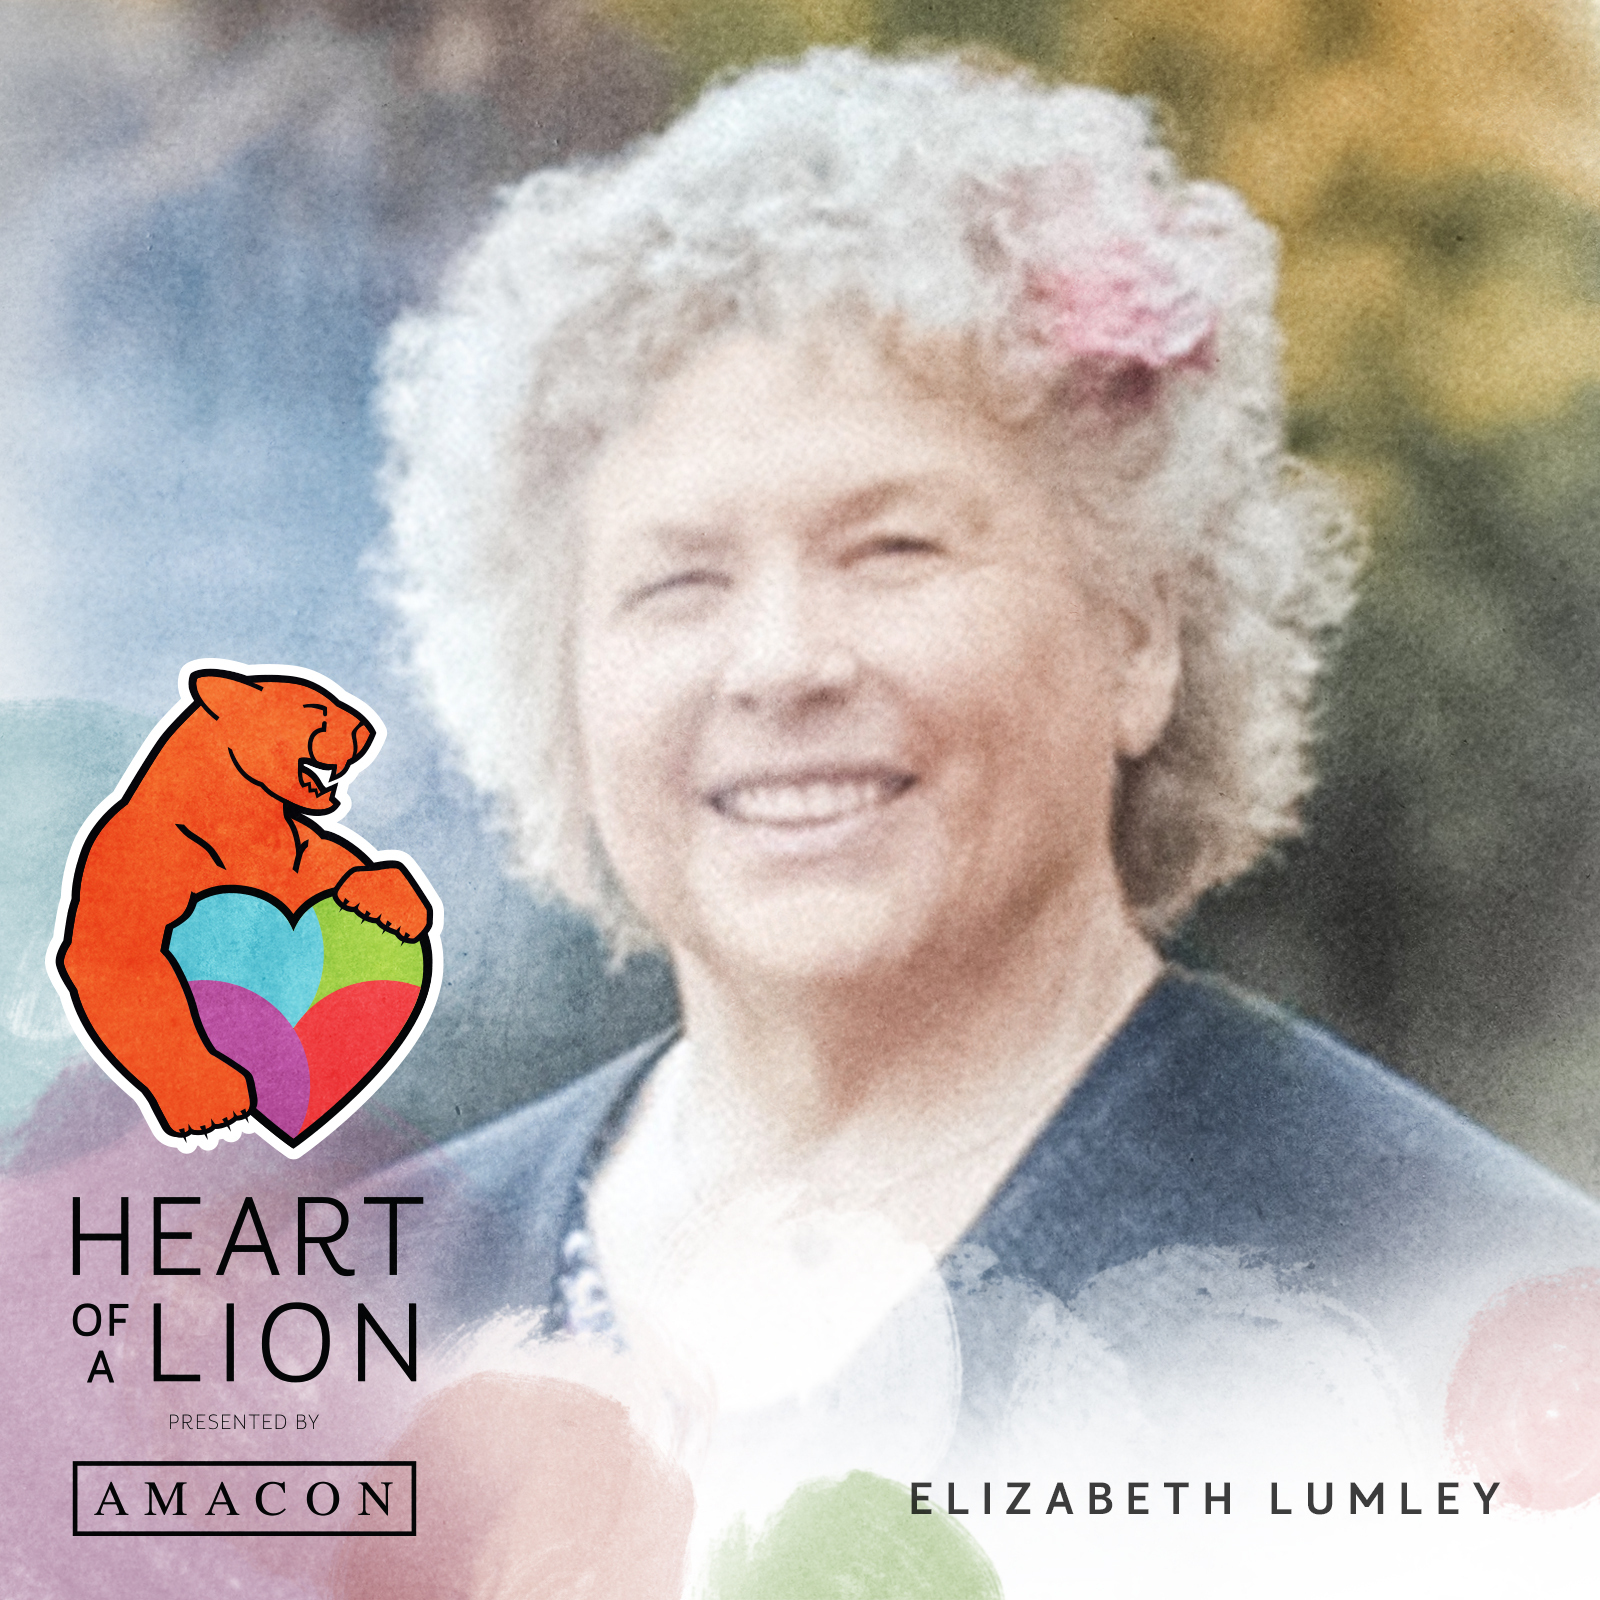 Elizabeth Lumley - Heart of a Lion Heroes Award Recipient